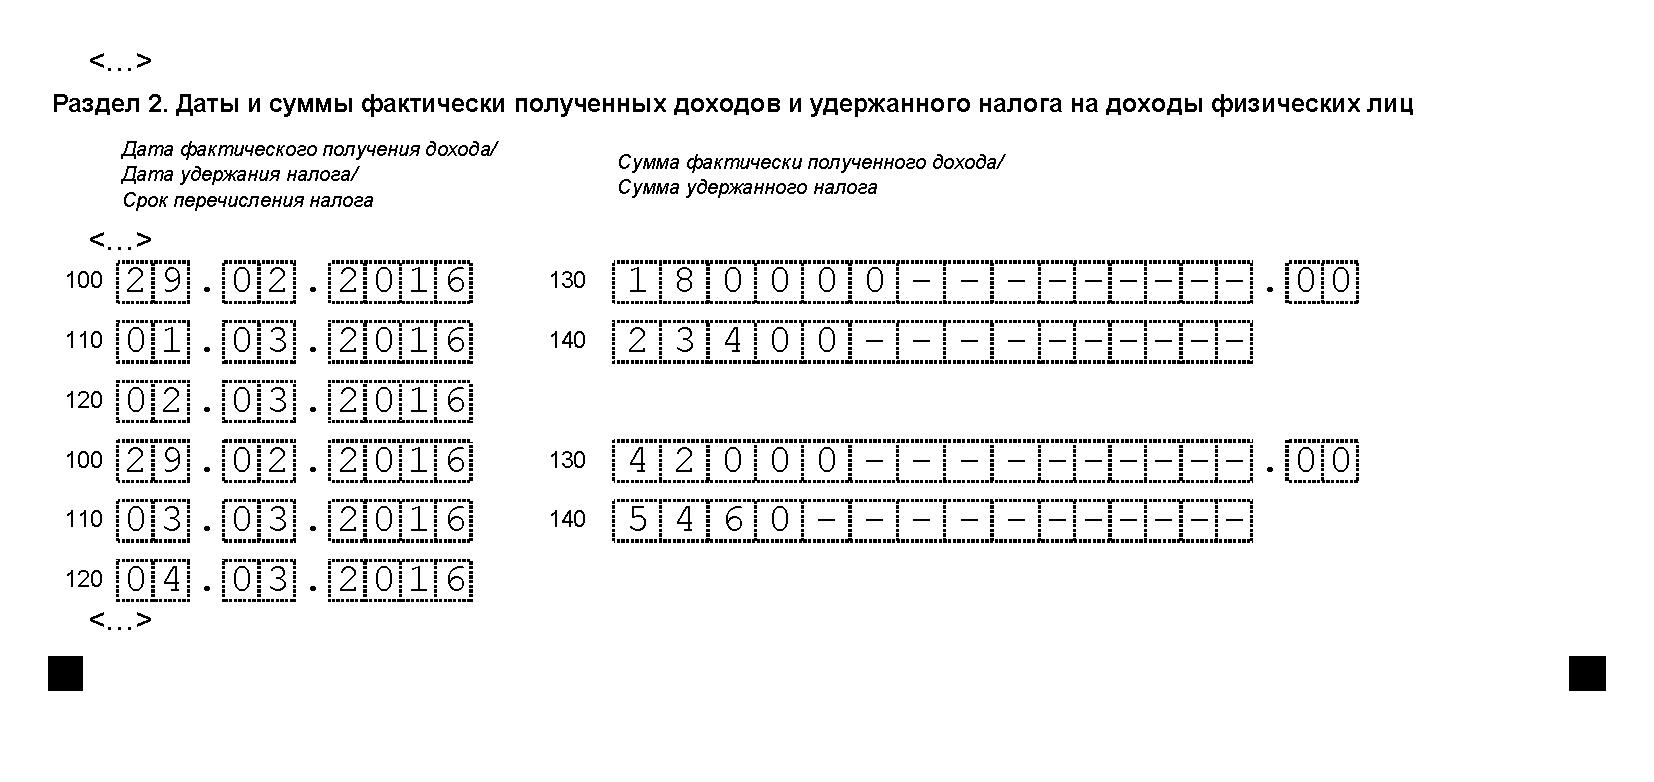 Форма 6-НДФЛ за 3 квартал 2016 года